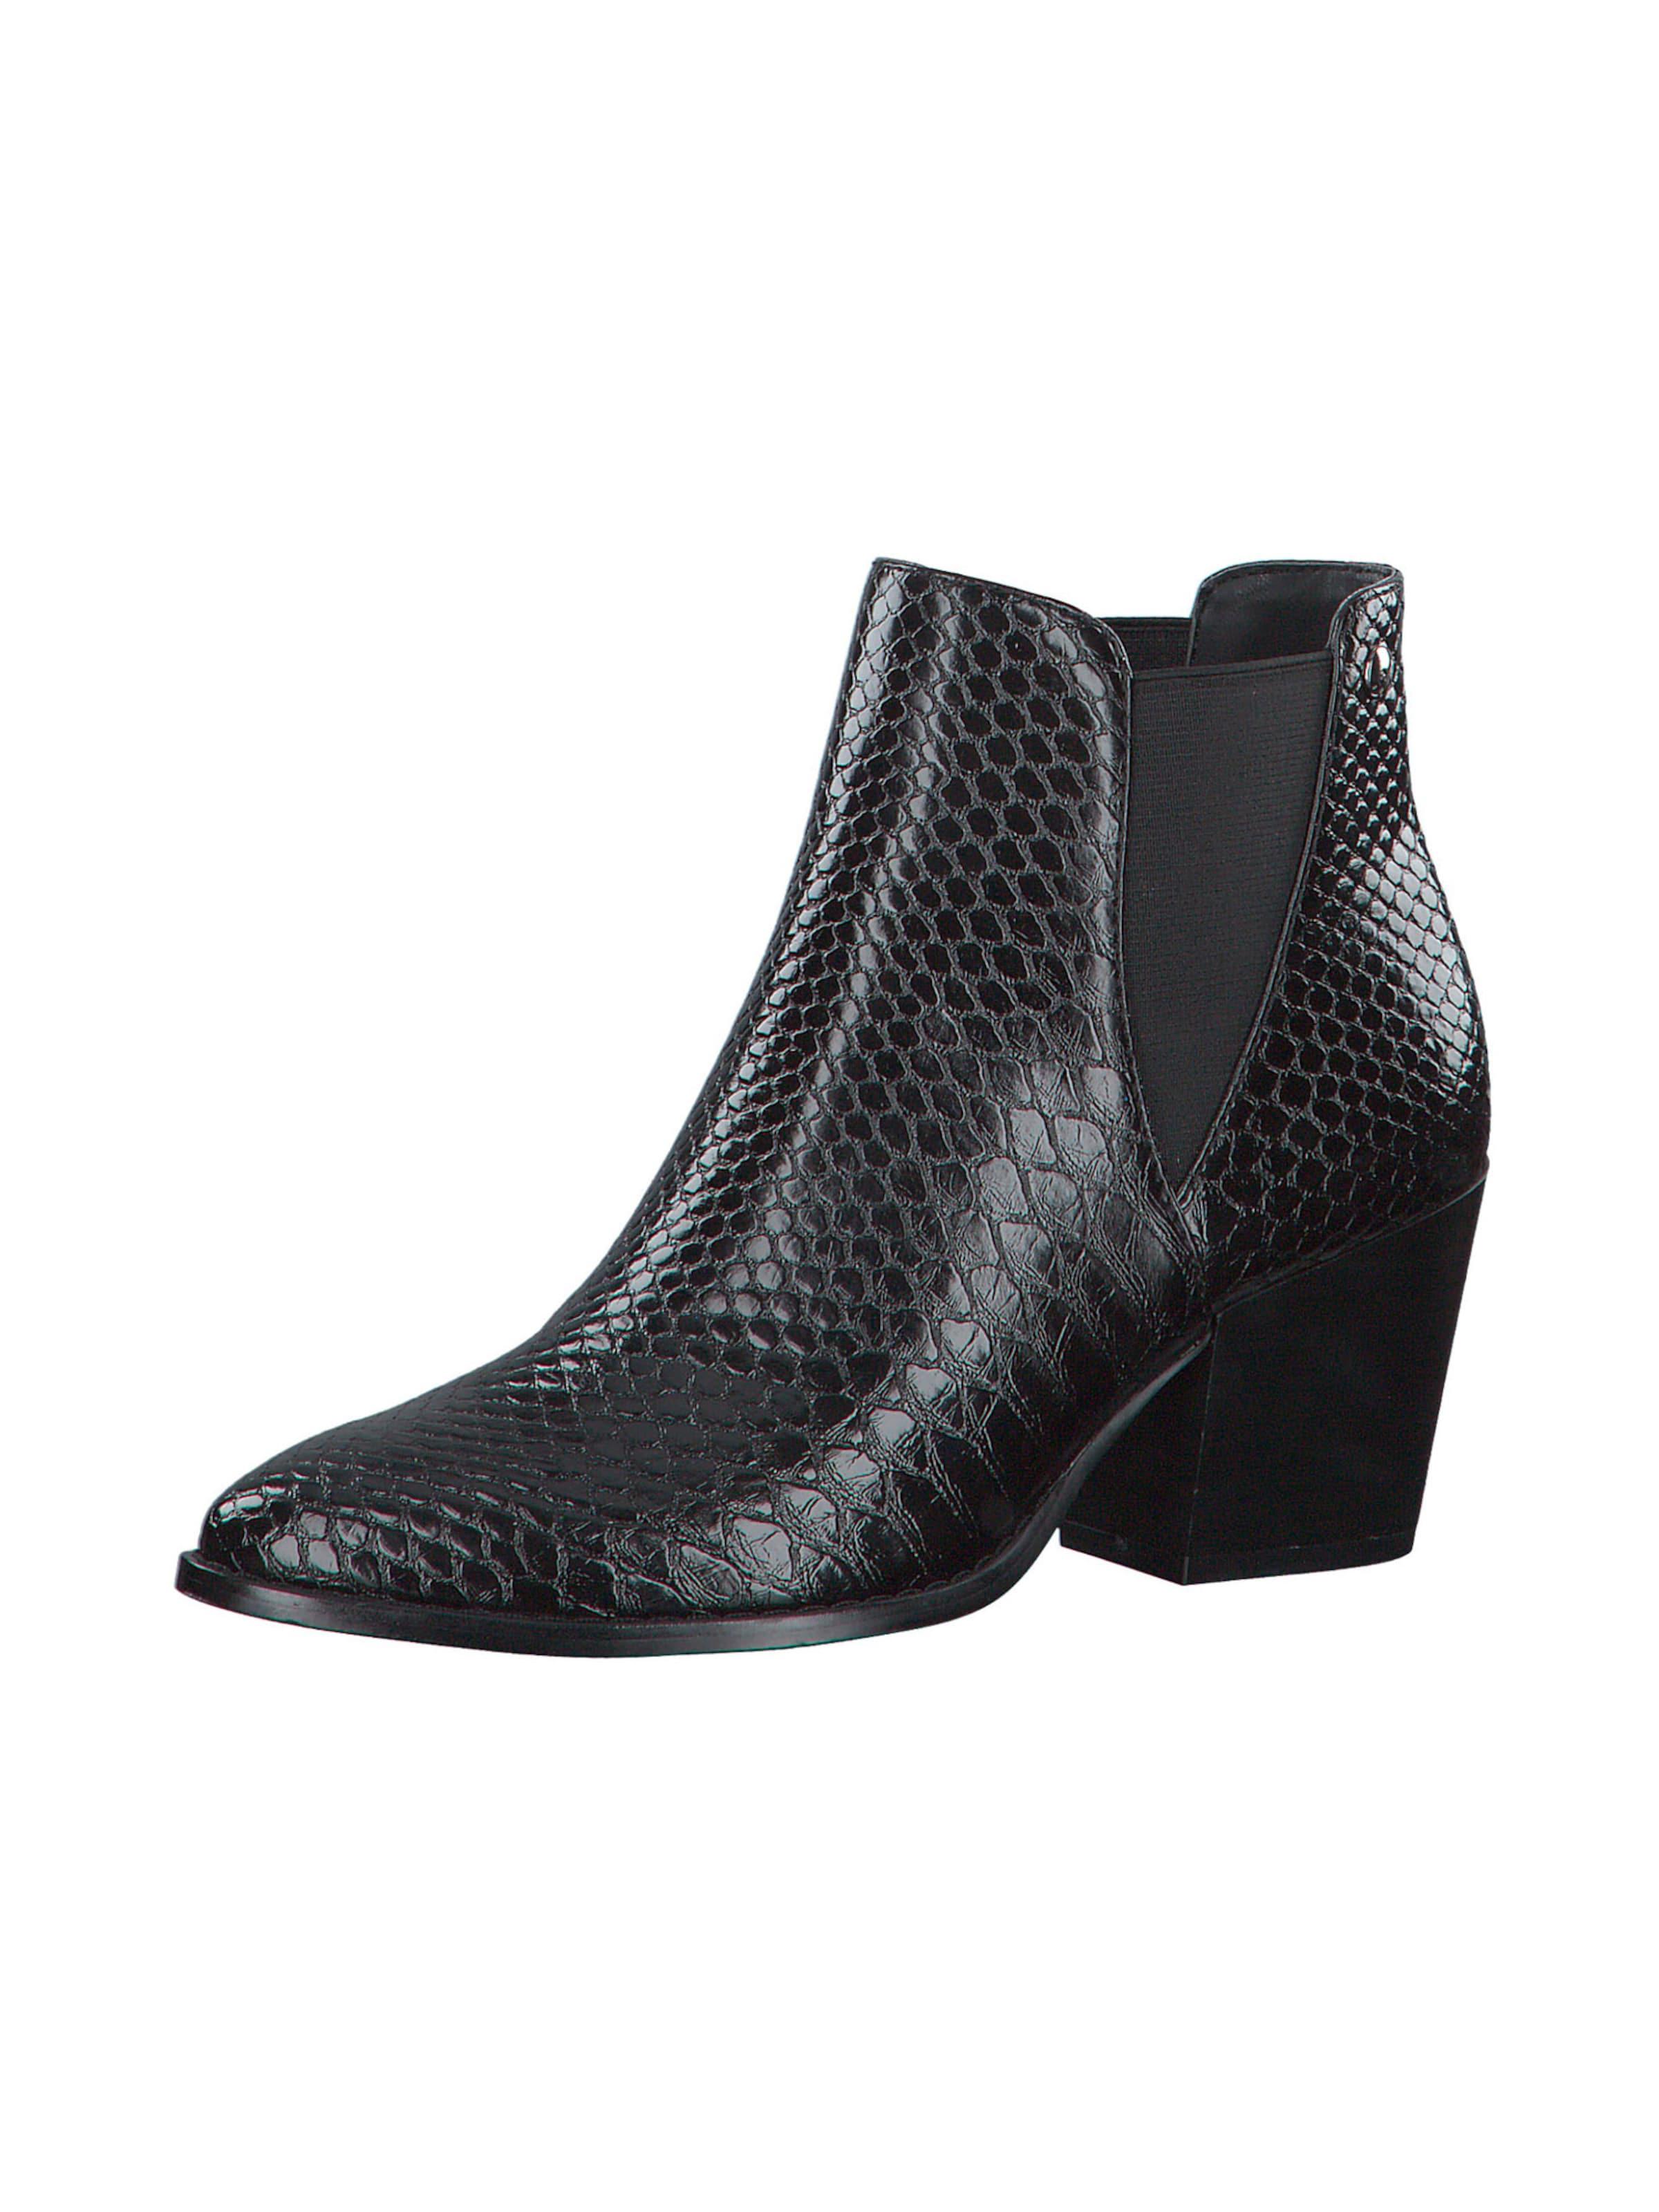 s.Oliver Chelsea boots i svart